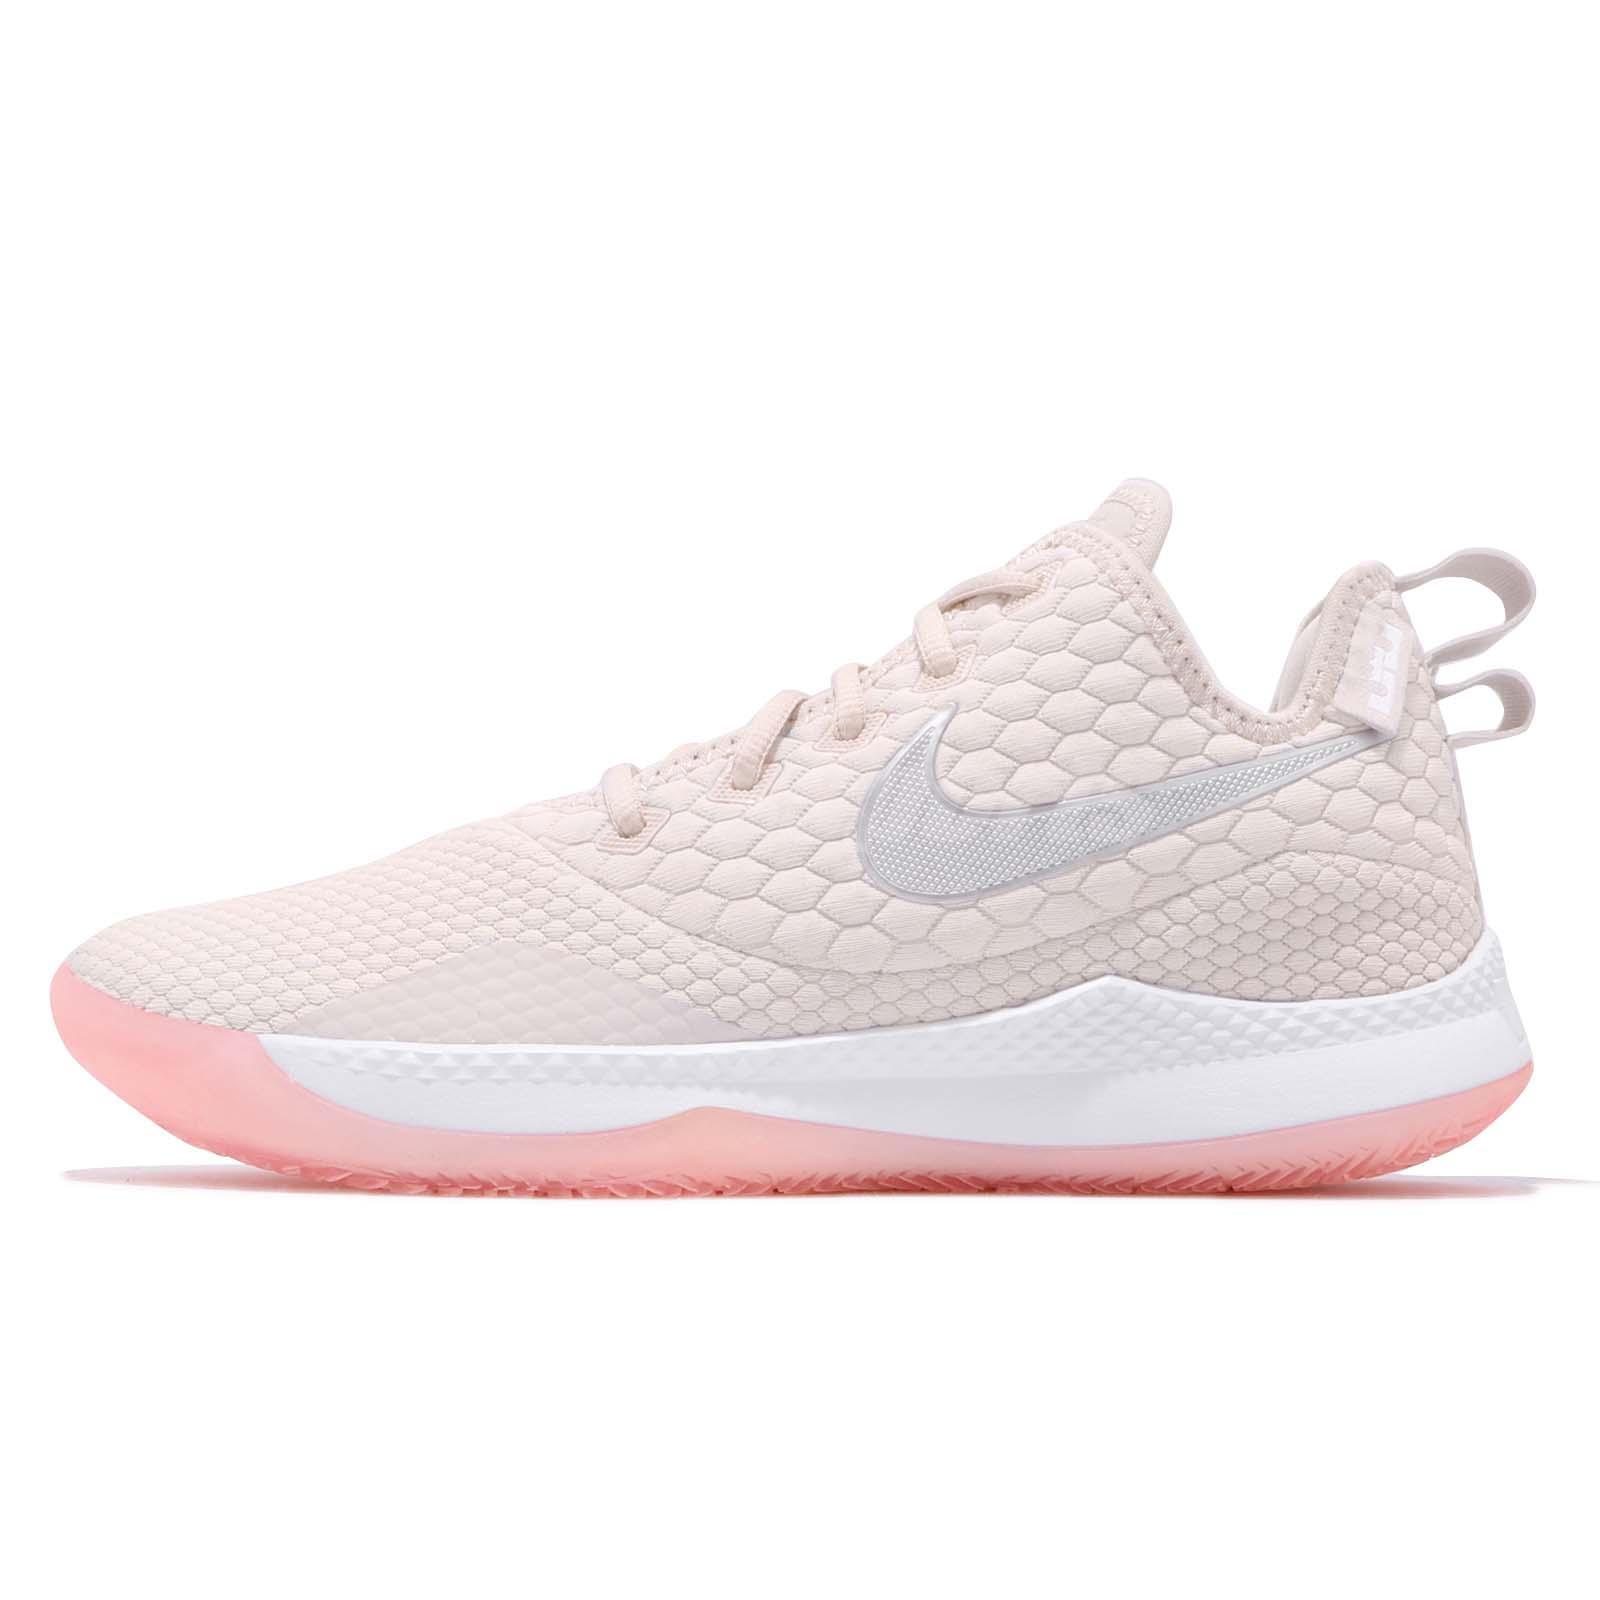 9d15c19d2d4 Nike LeBron Witness III EP 3 James LBJ Light Orewood Brown Men Shoes  AO4432-100